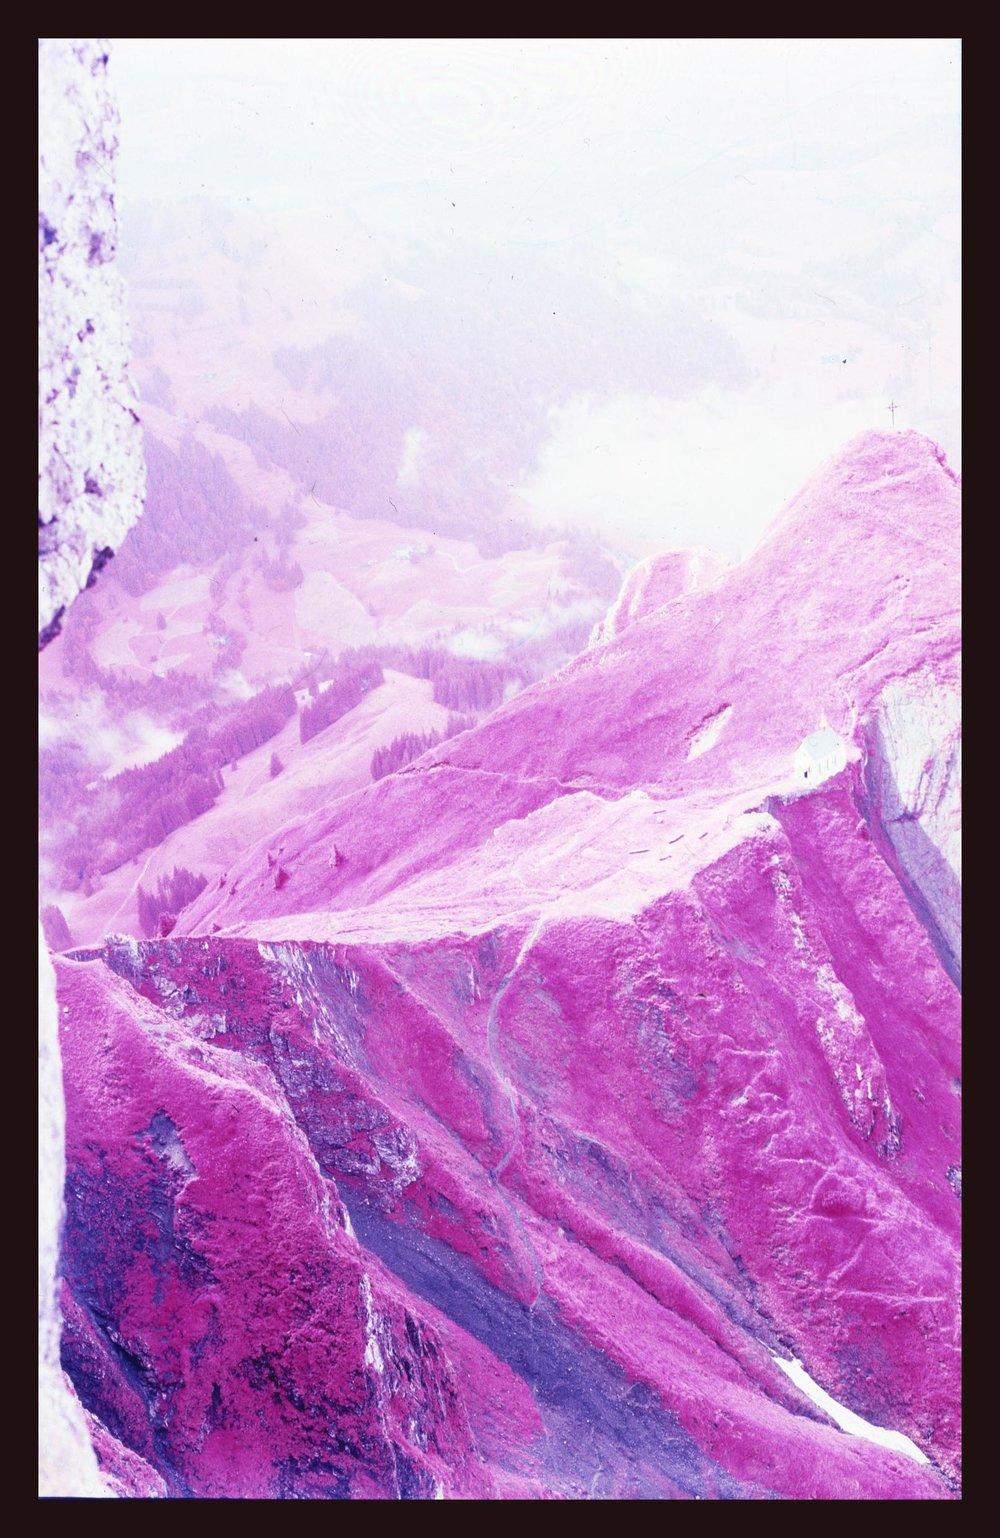 Mount Pilatus, Switerzland